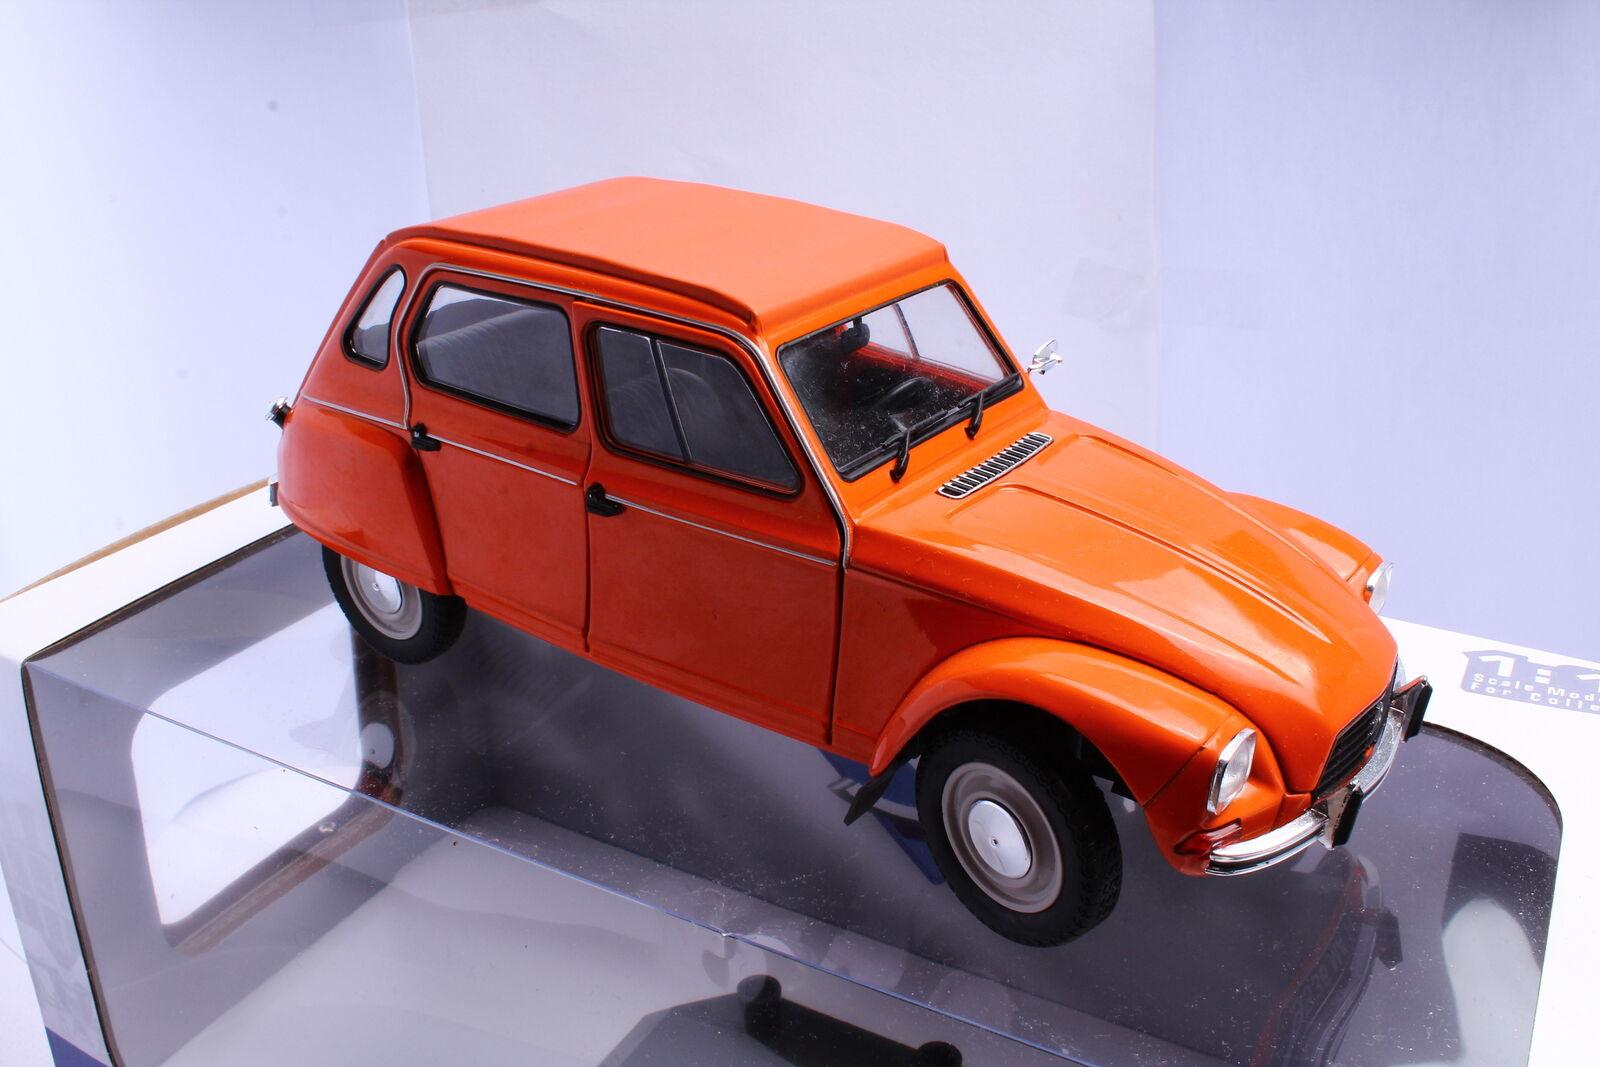 Solido S1800304 Citroën Dyane Dyane Dyane 1974 orange Tenere 1 18 OVP 2b4fb8